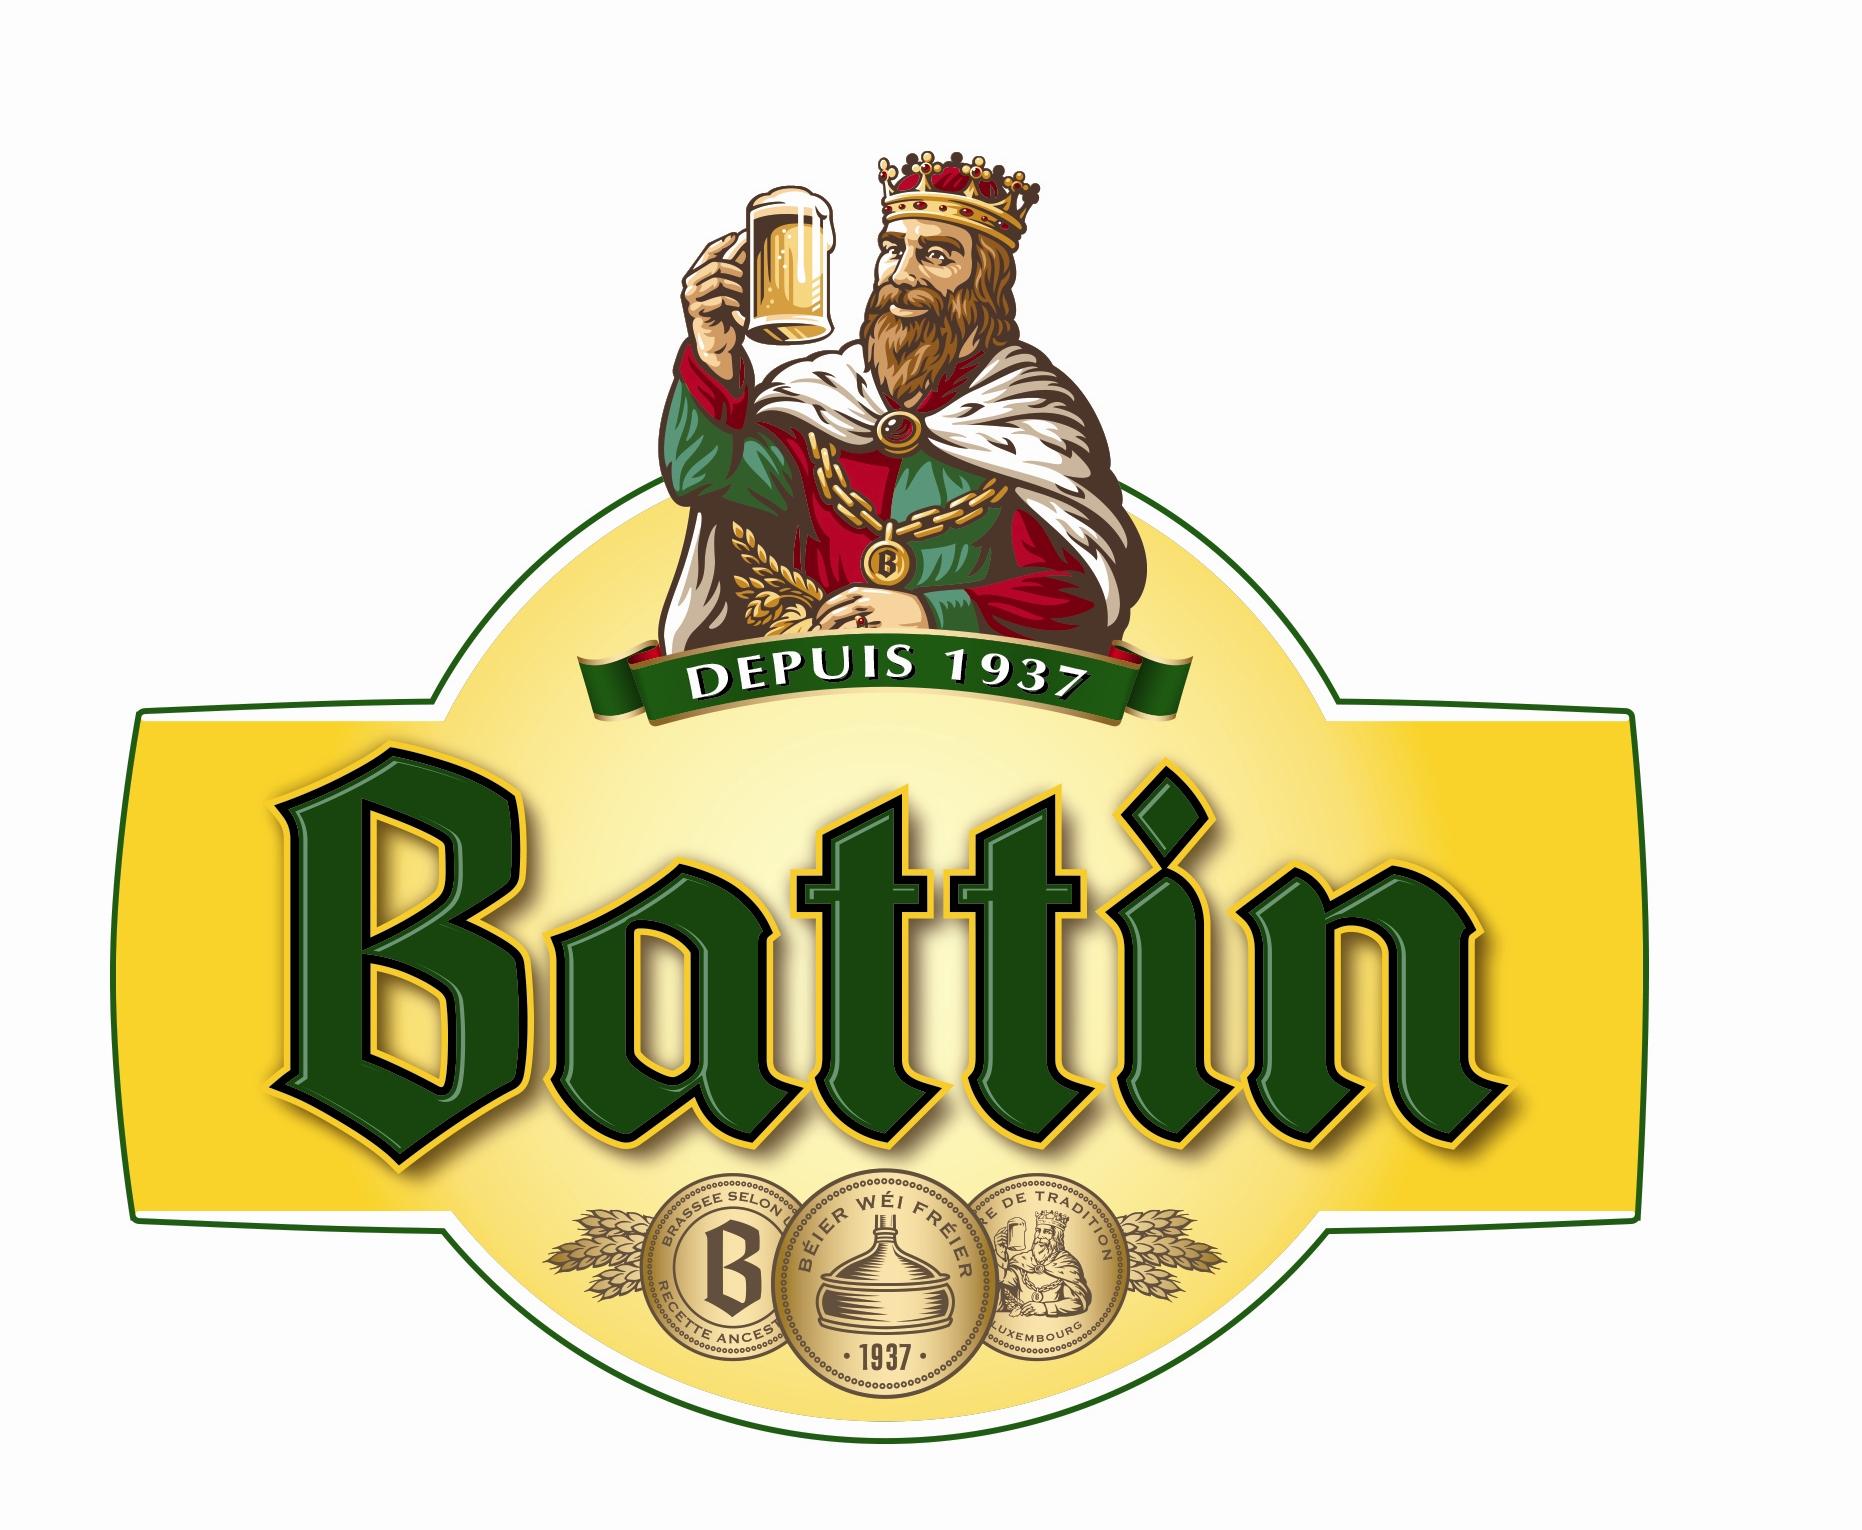 http://battin.lu/